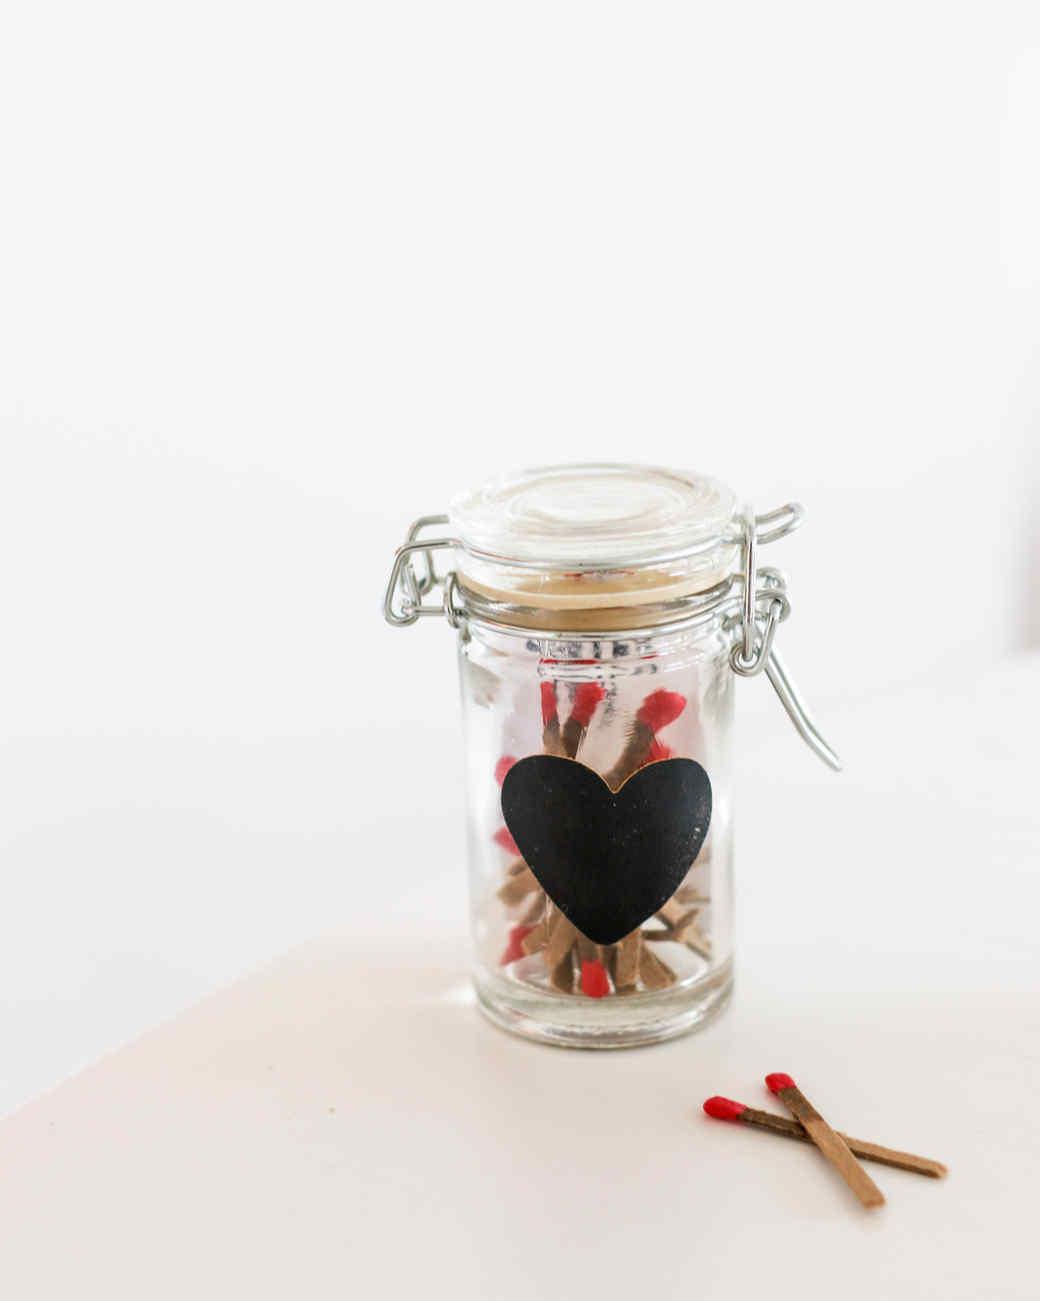 strike-anywhere match jar valentine